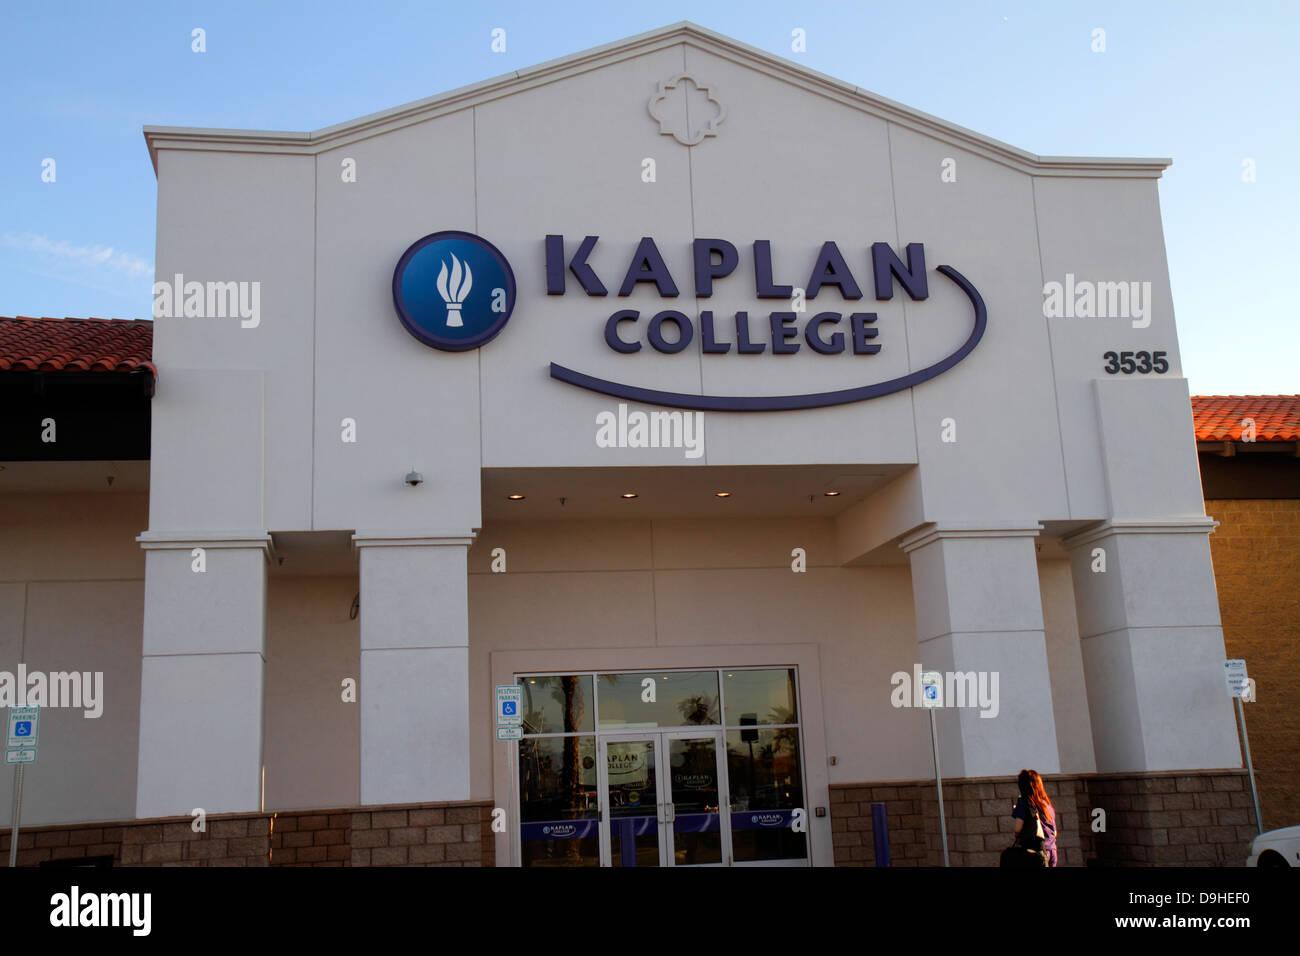 Colleges In Las Vegas >> Nevada Las Vegas West Sahara Avenue Kaplan College Front